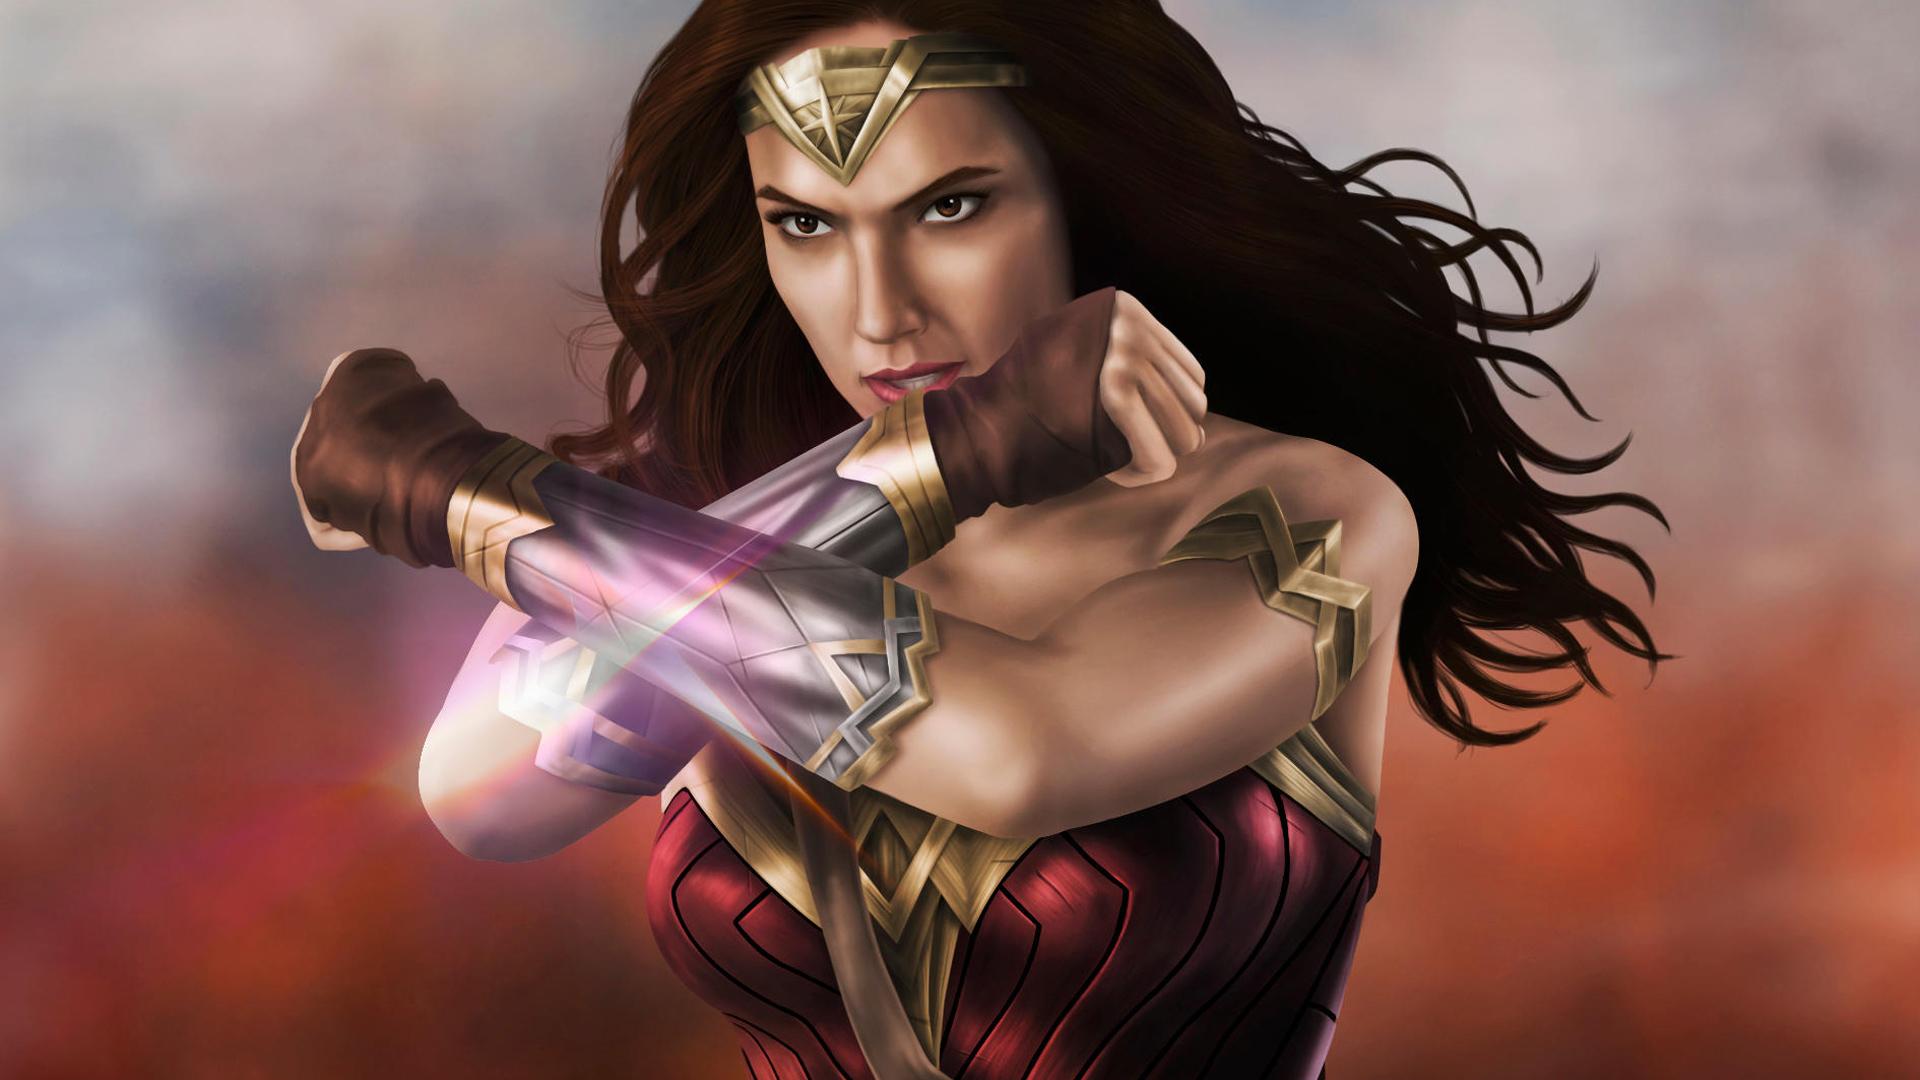 Gal Gadot Wonder Woman New Art Hd Superheroes 4k